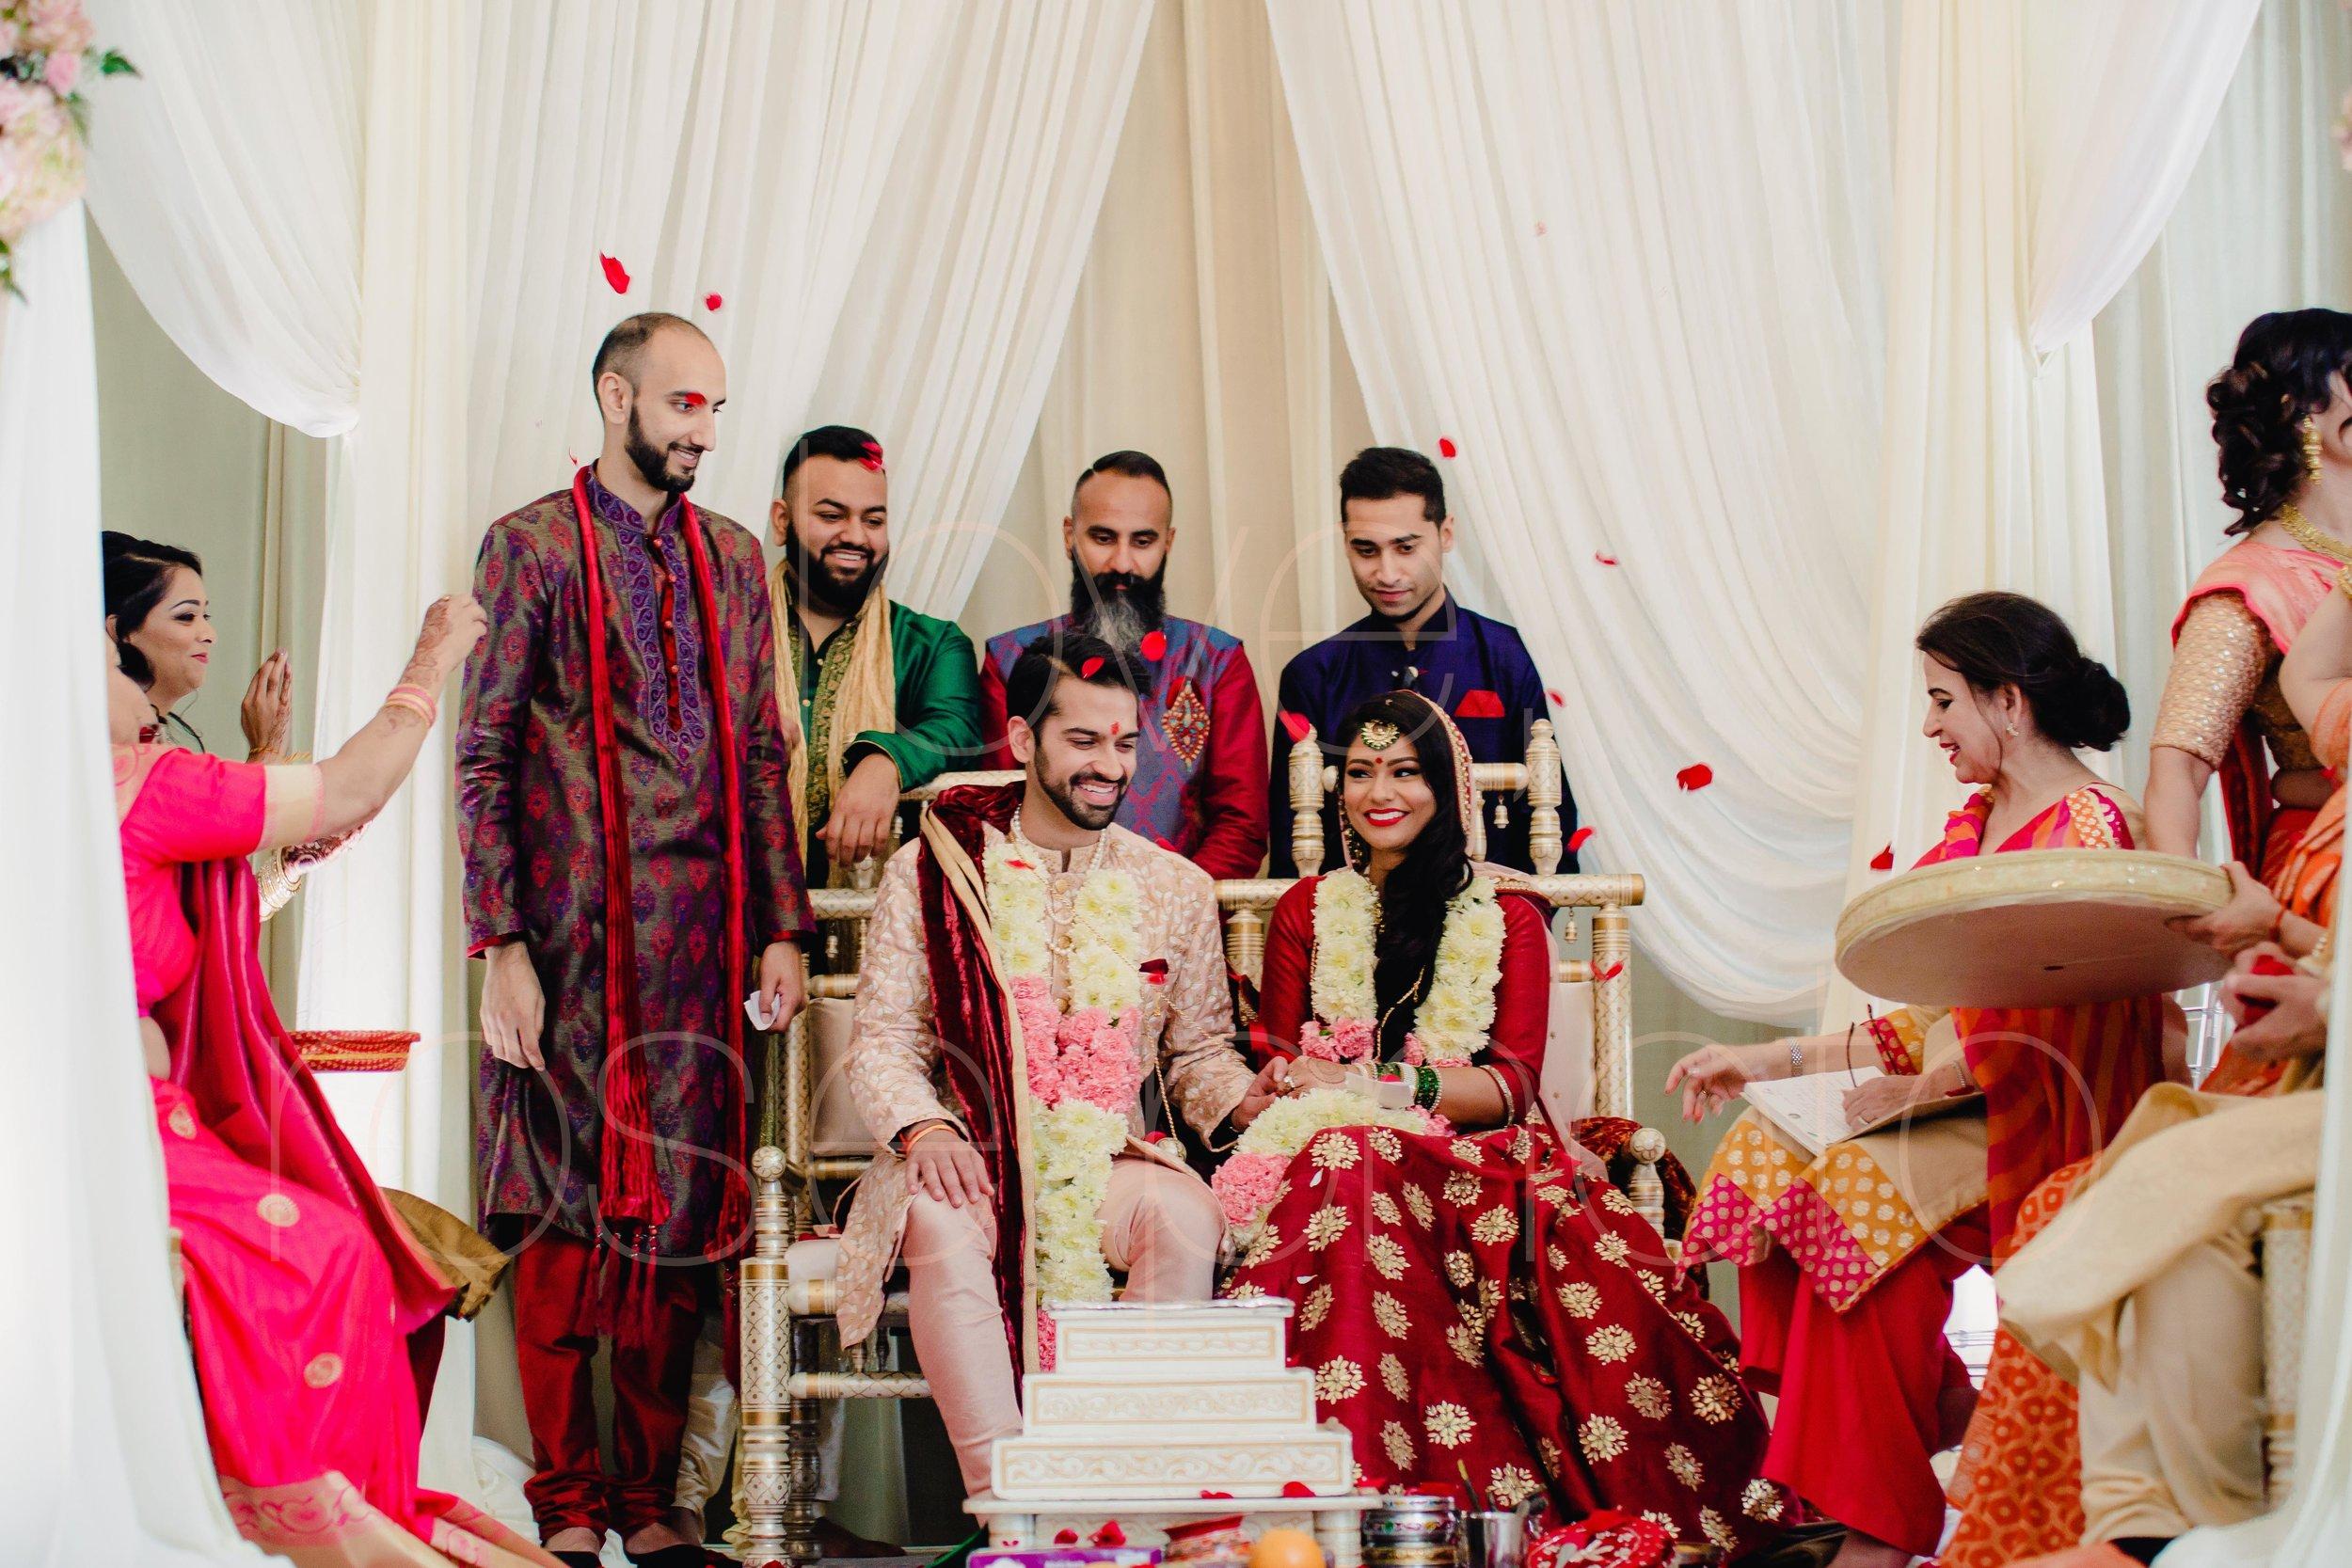 Chicago Indian Wedding best photography lifestyle wedding portrait luxury wedding-39.jpg